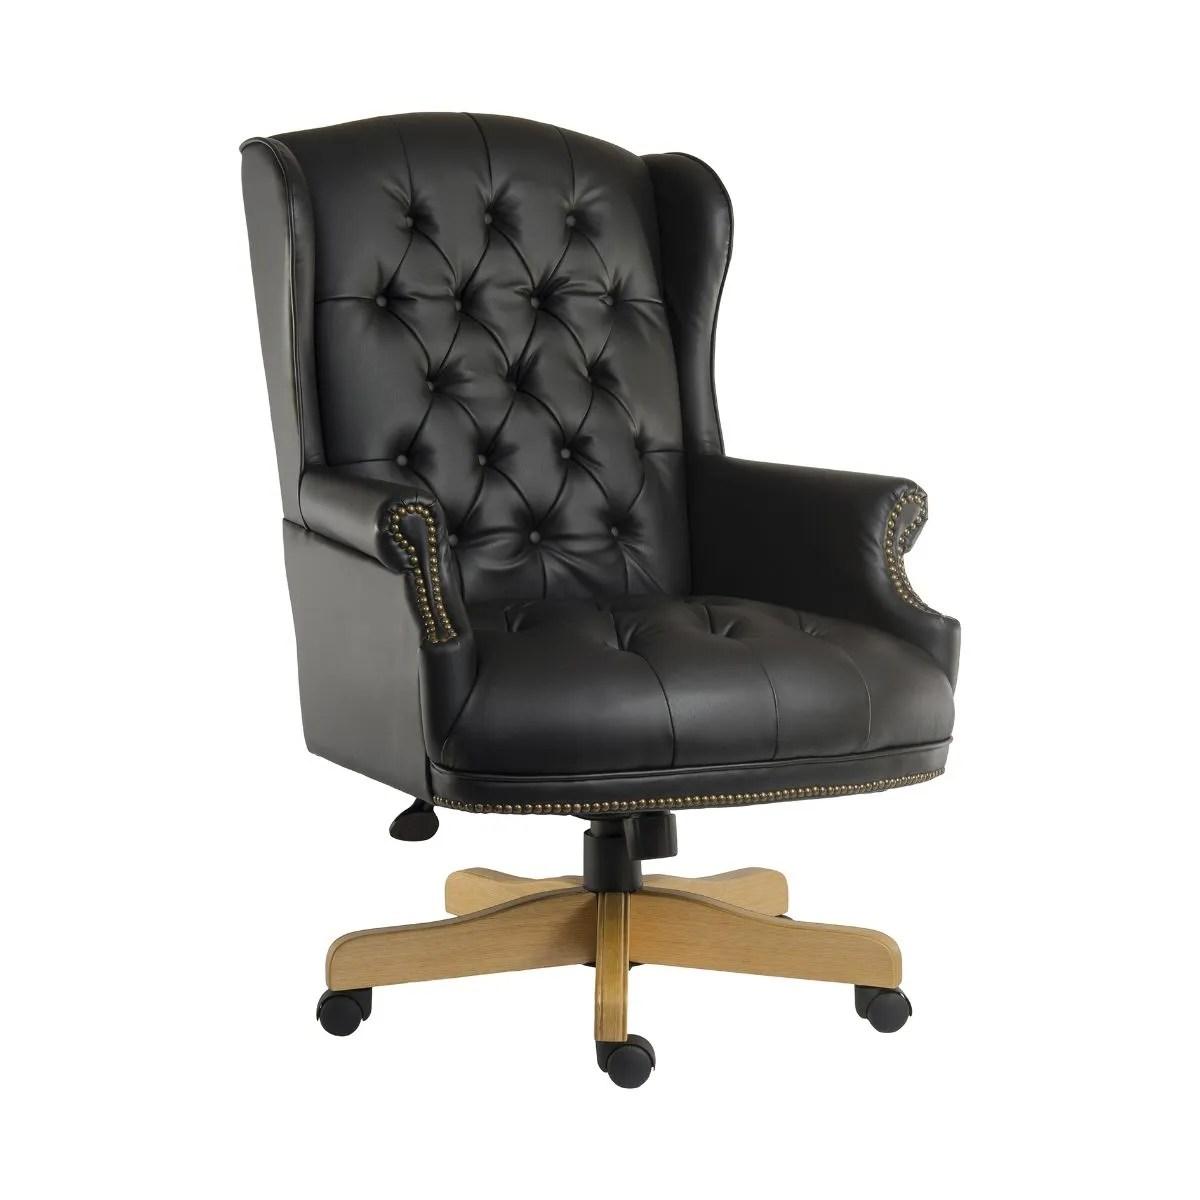 swivel chair executive cheap spandex folding covers for sale ryman chairman office black